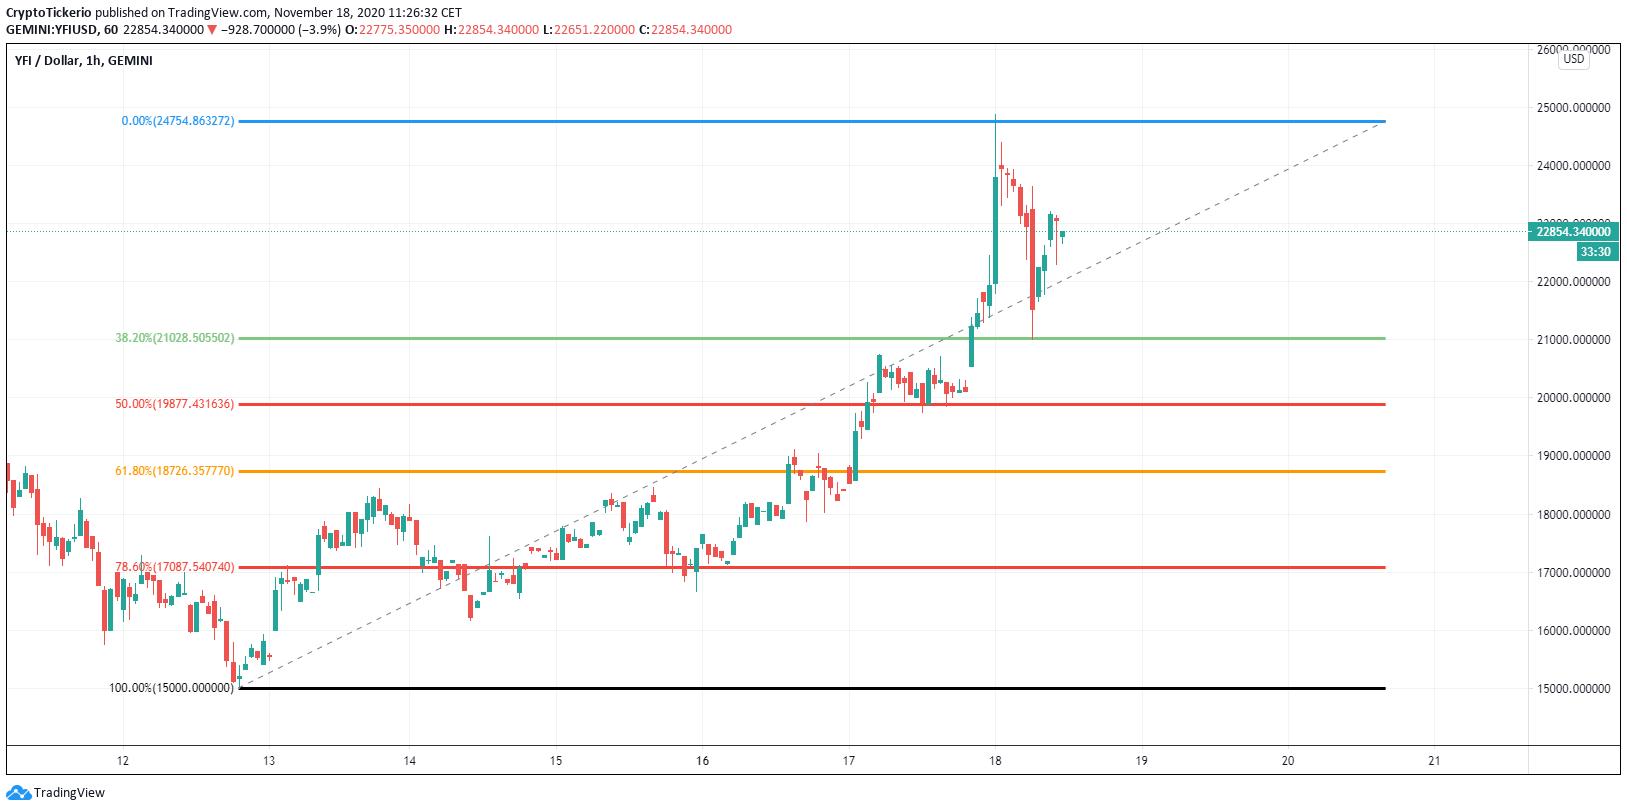 YFI/USD 1 Hour chart, Fibonacci retracement for potential entries